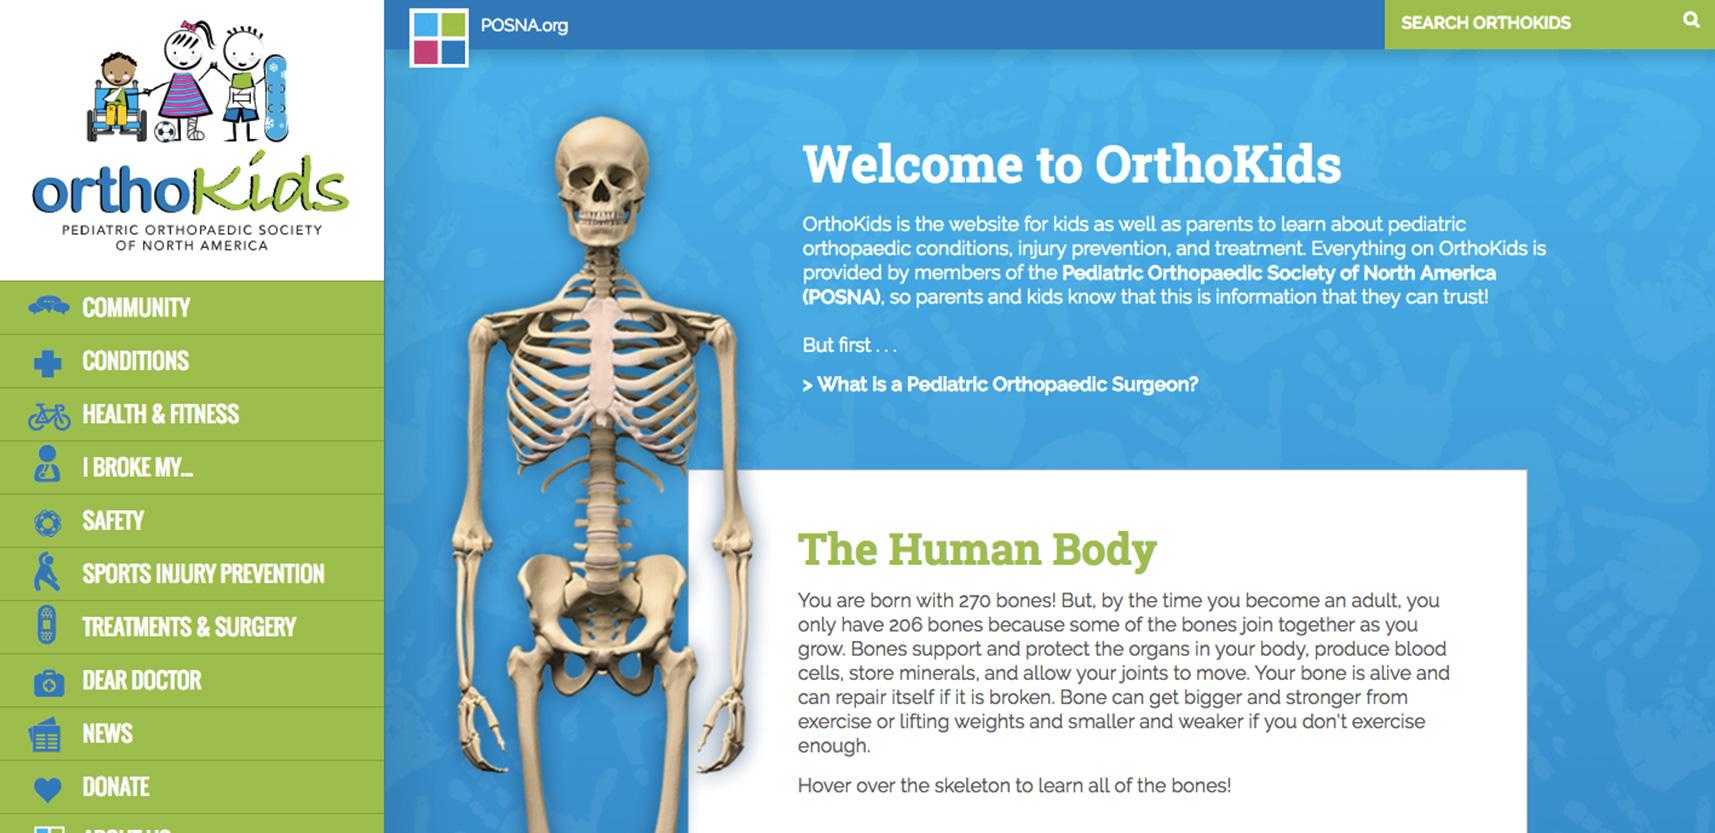 OrthoKids